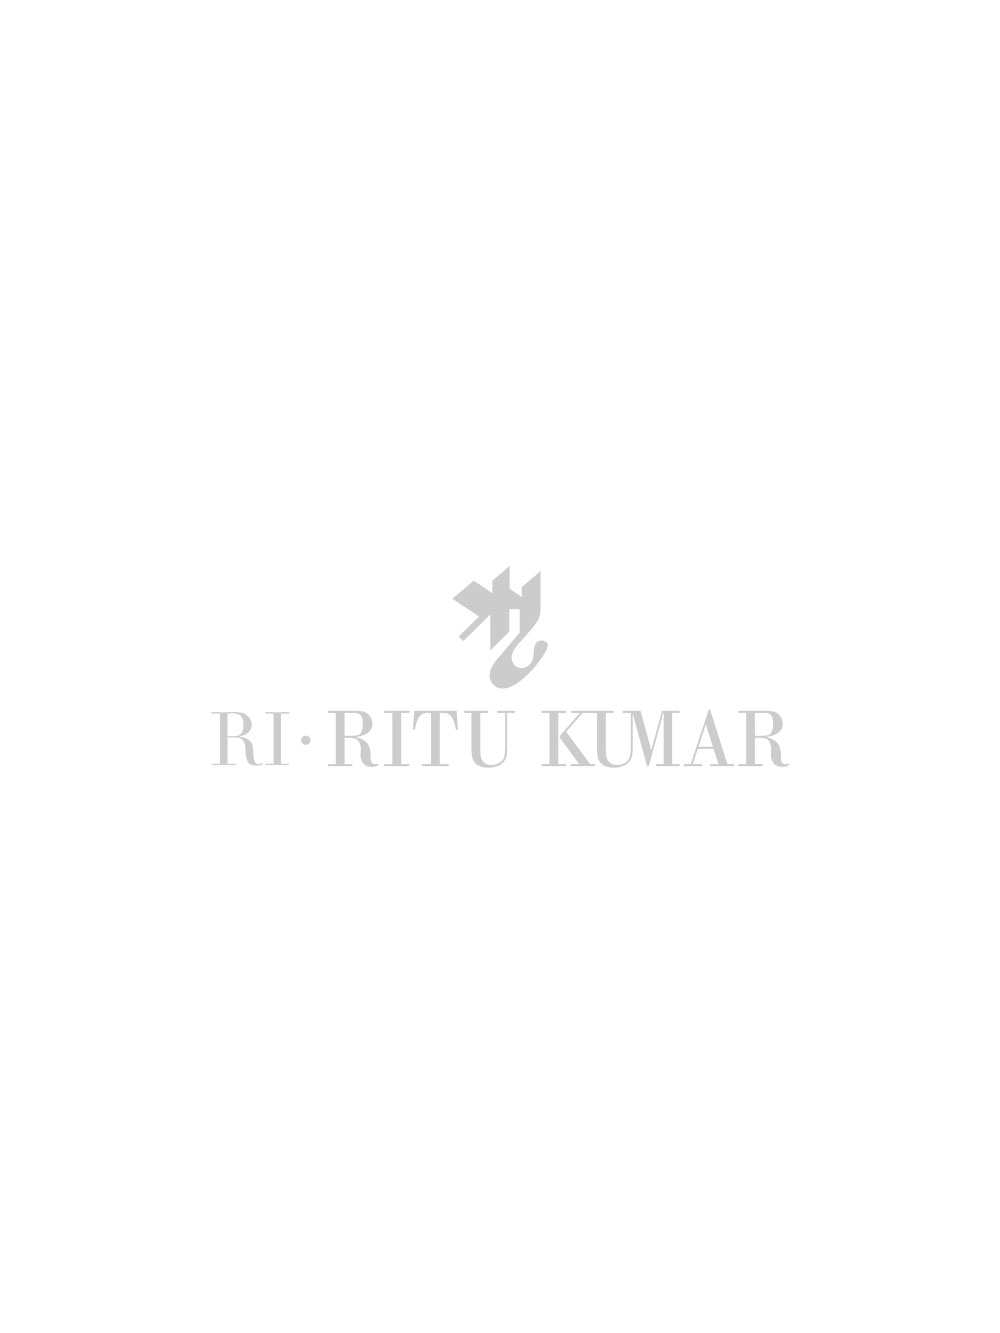 Khaki & Indigo Embroidered Kurta With Dupatta And Churidar